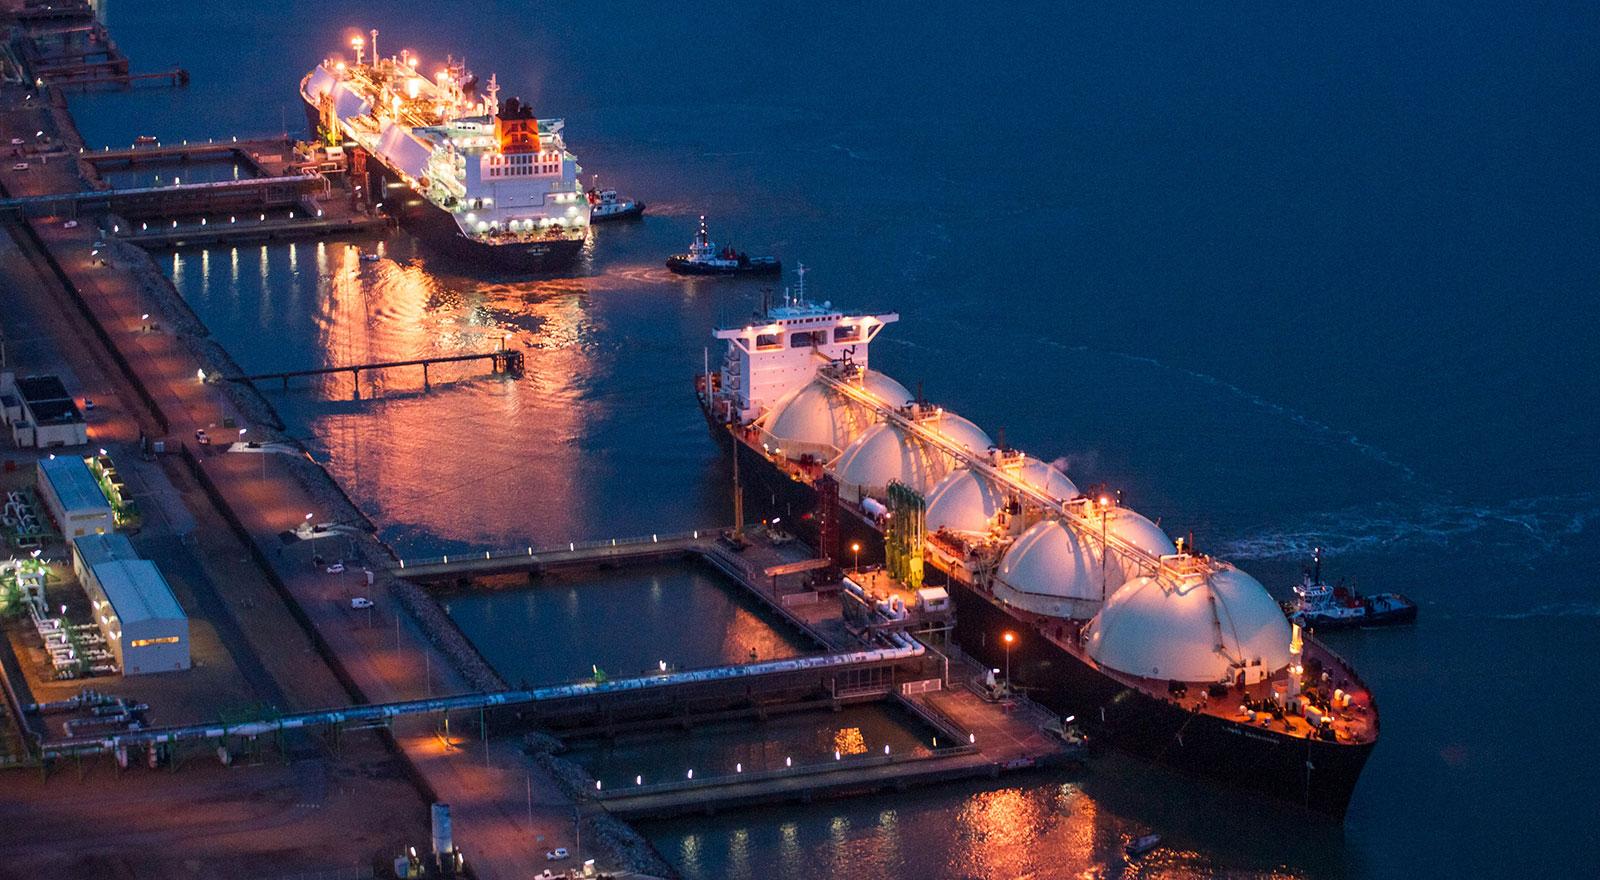 Kόμβο διανομής LNG στο Μπαχρέιν εξετάζει η Gazprom